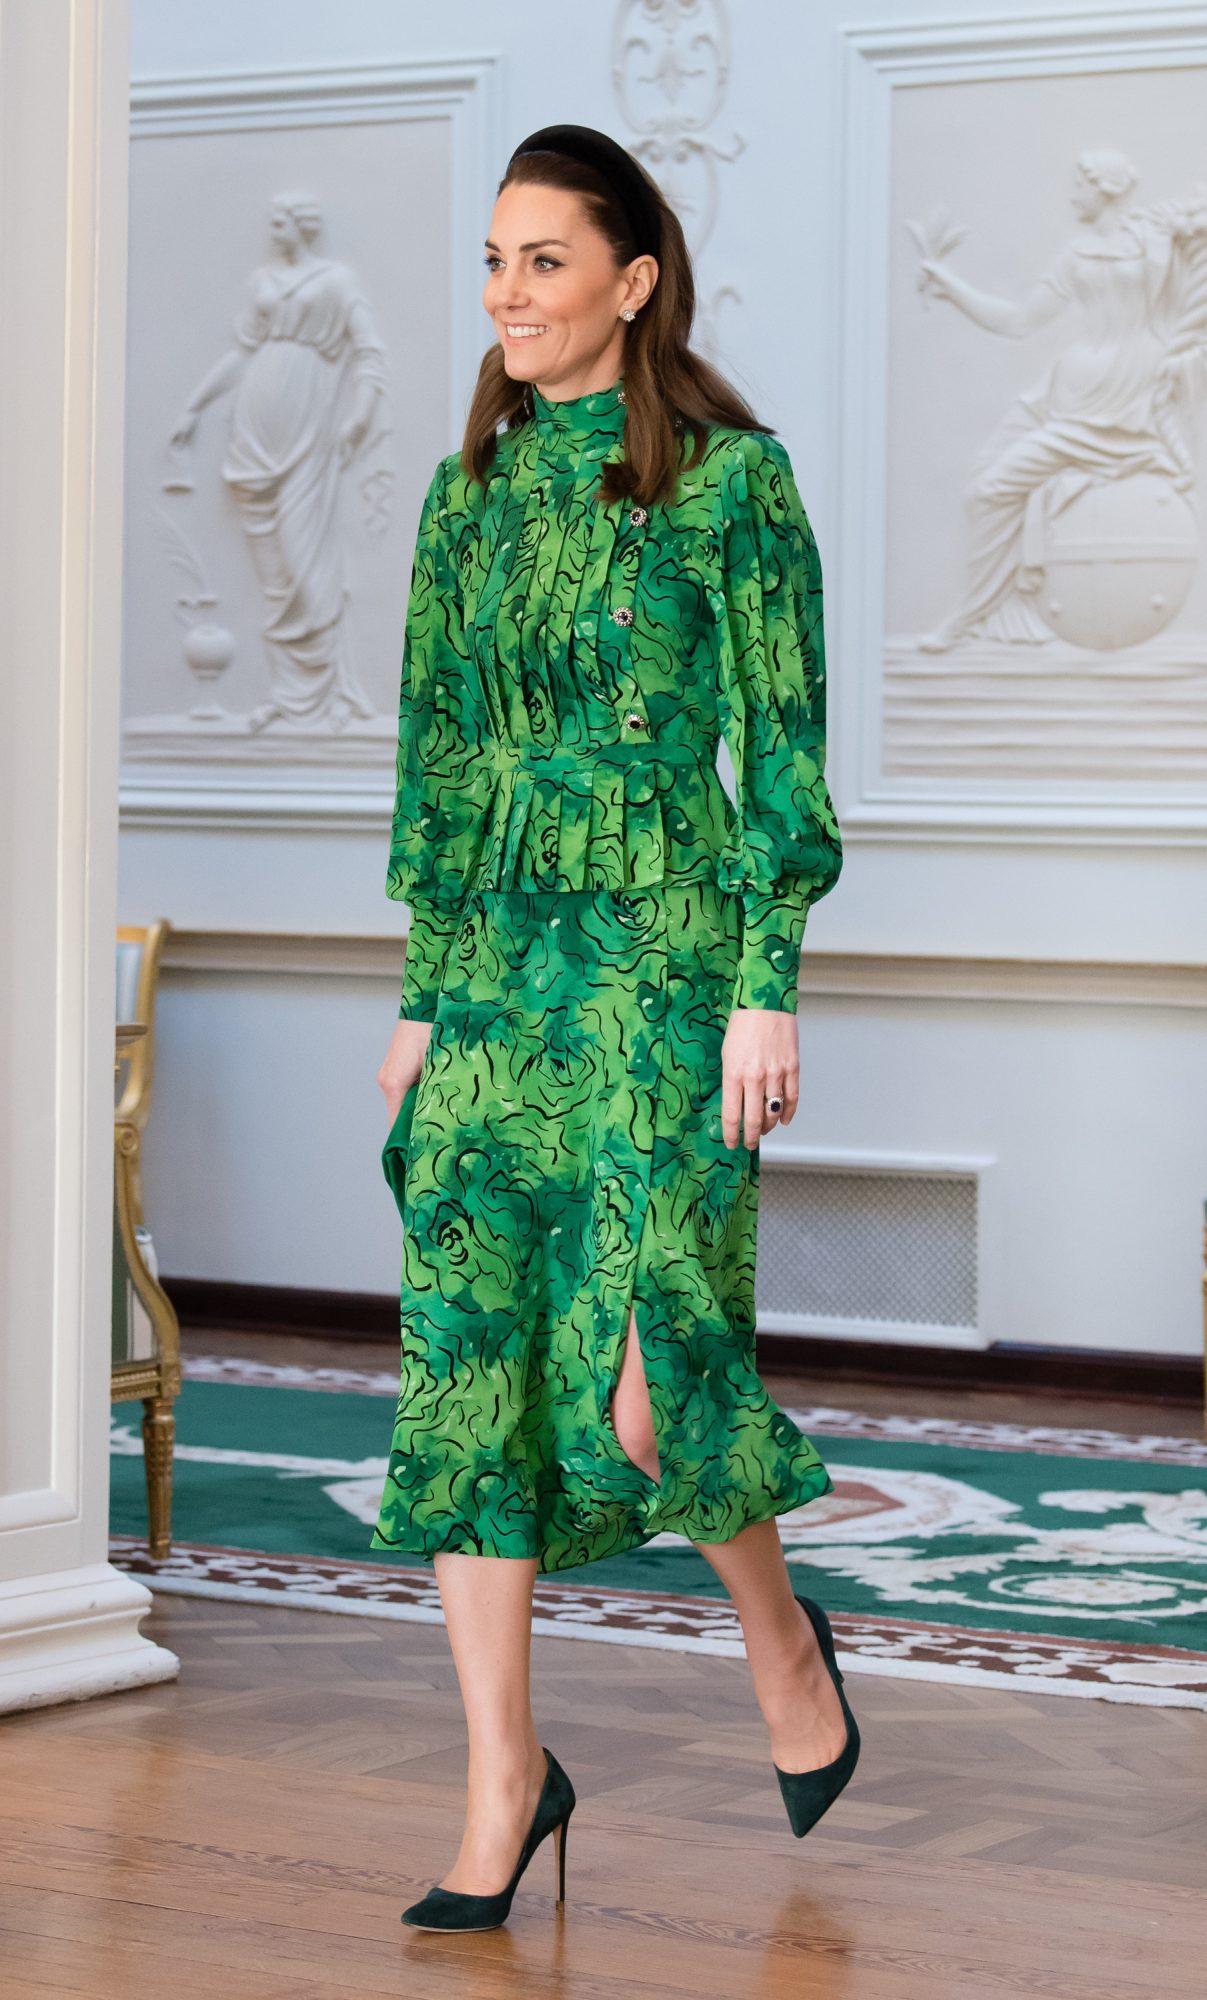 Kate Middleton, mejores looks, looks, londres